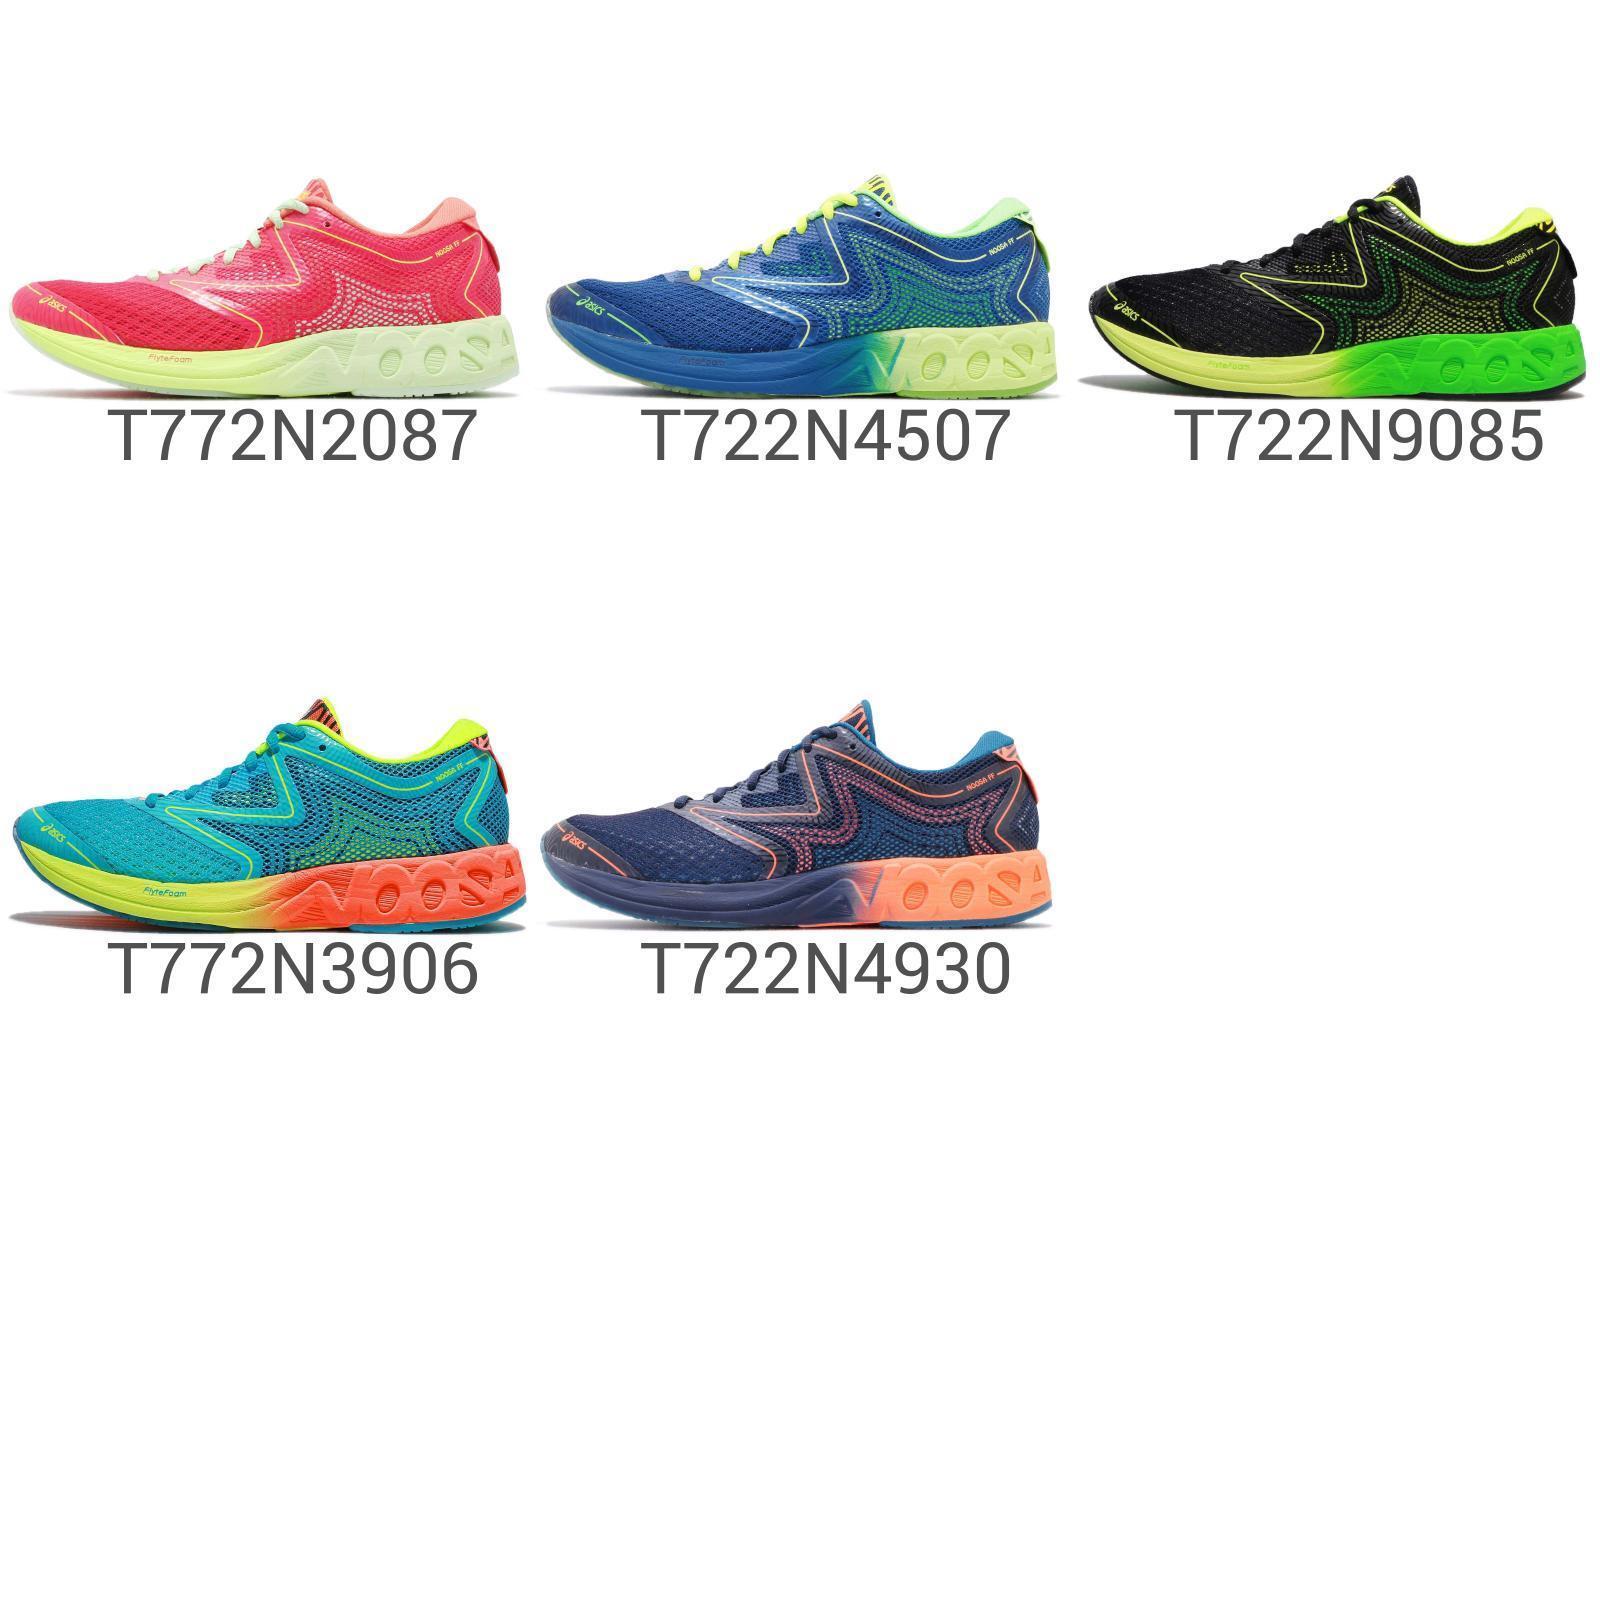 3a0a1b02 Asics FF FlyteFoam Gel Mens mujer Runnign zapatos Athletic zapatillas Pick  1 Noosa ndnxoa4871-Zapatillas deportivas